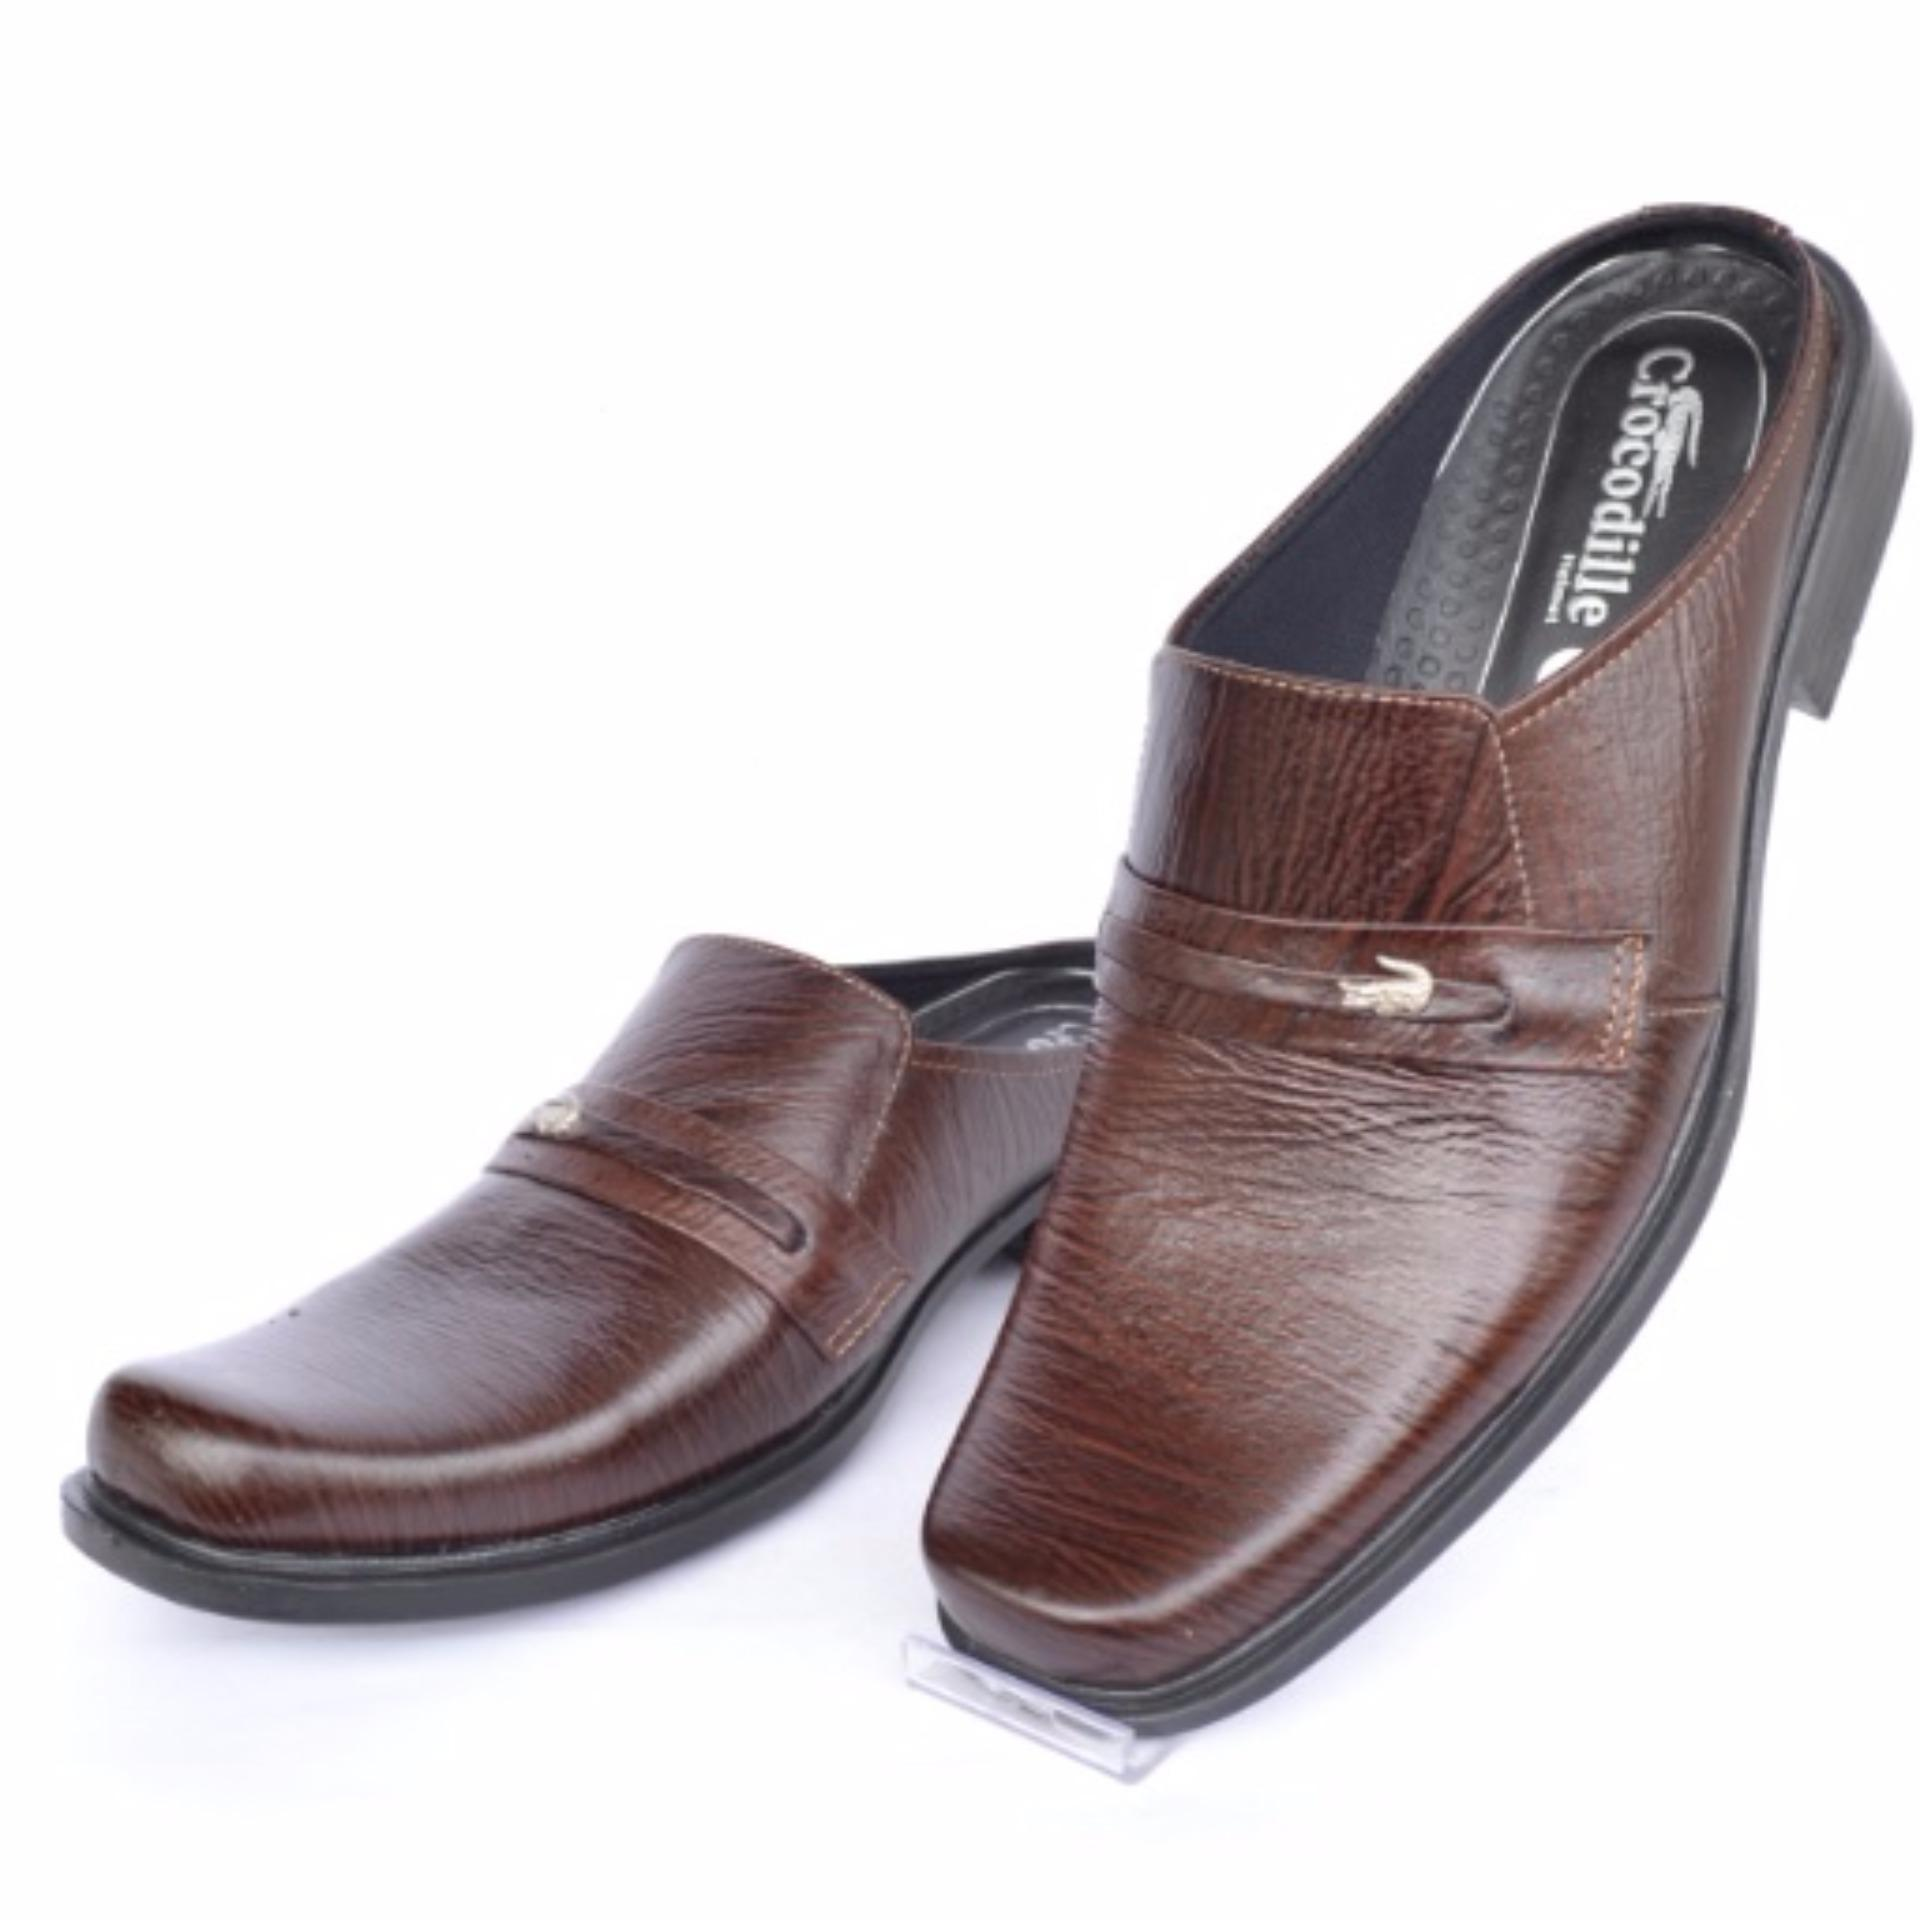 Crocodile Sepatu Sandal Selop - Sandal Sepatu Pria - Sandal Pria -Kulit Sapi Asli - A2 Coklat